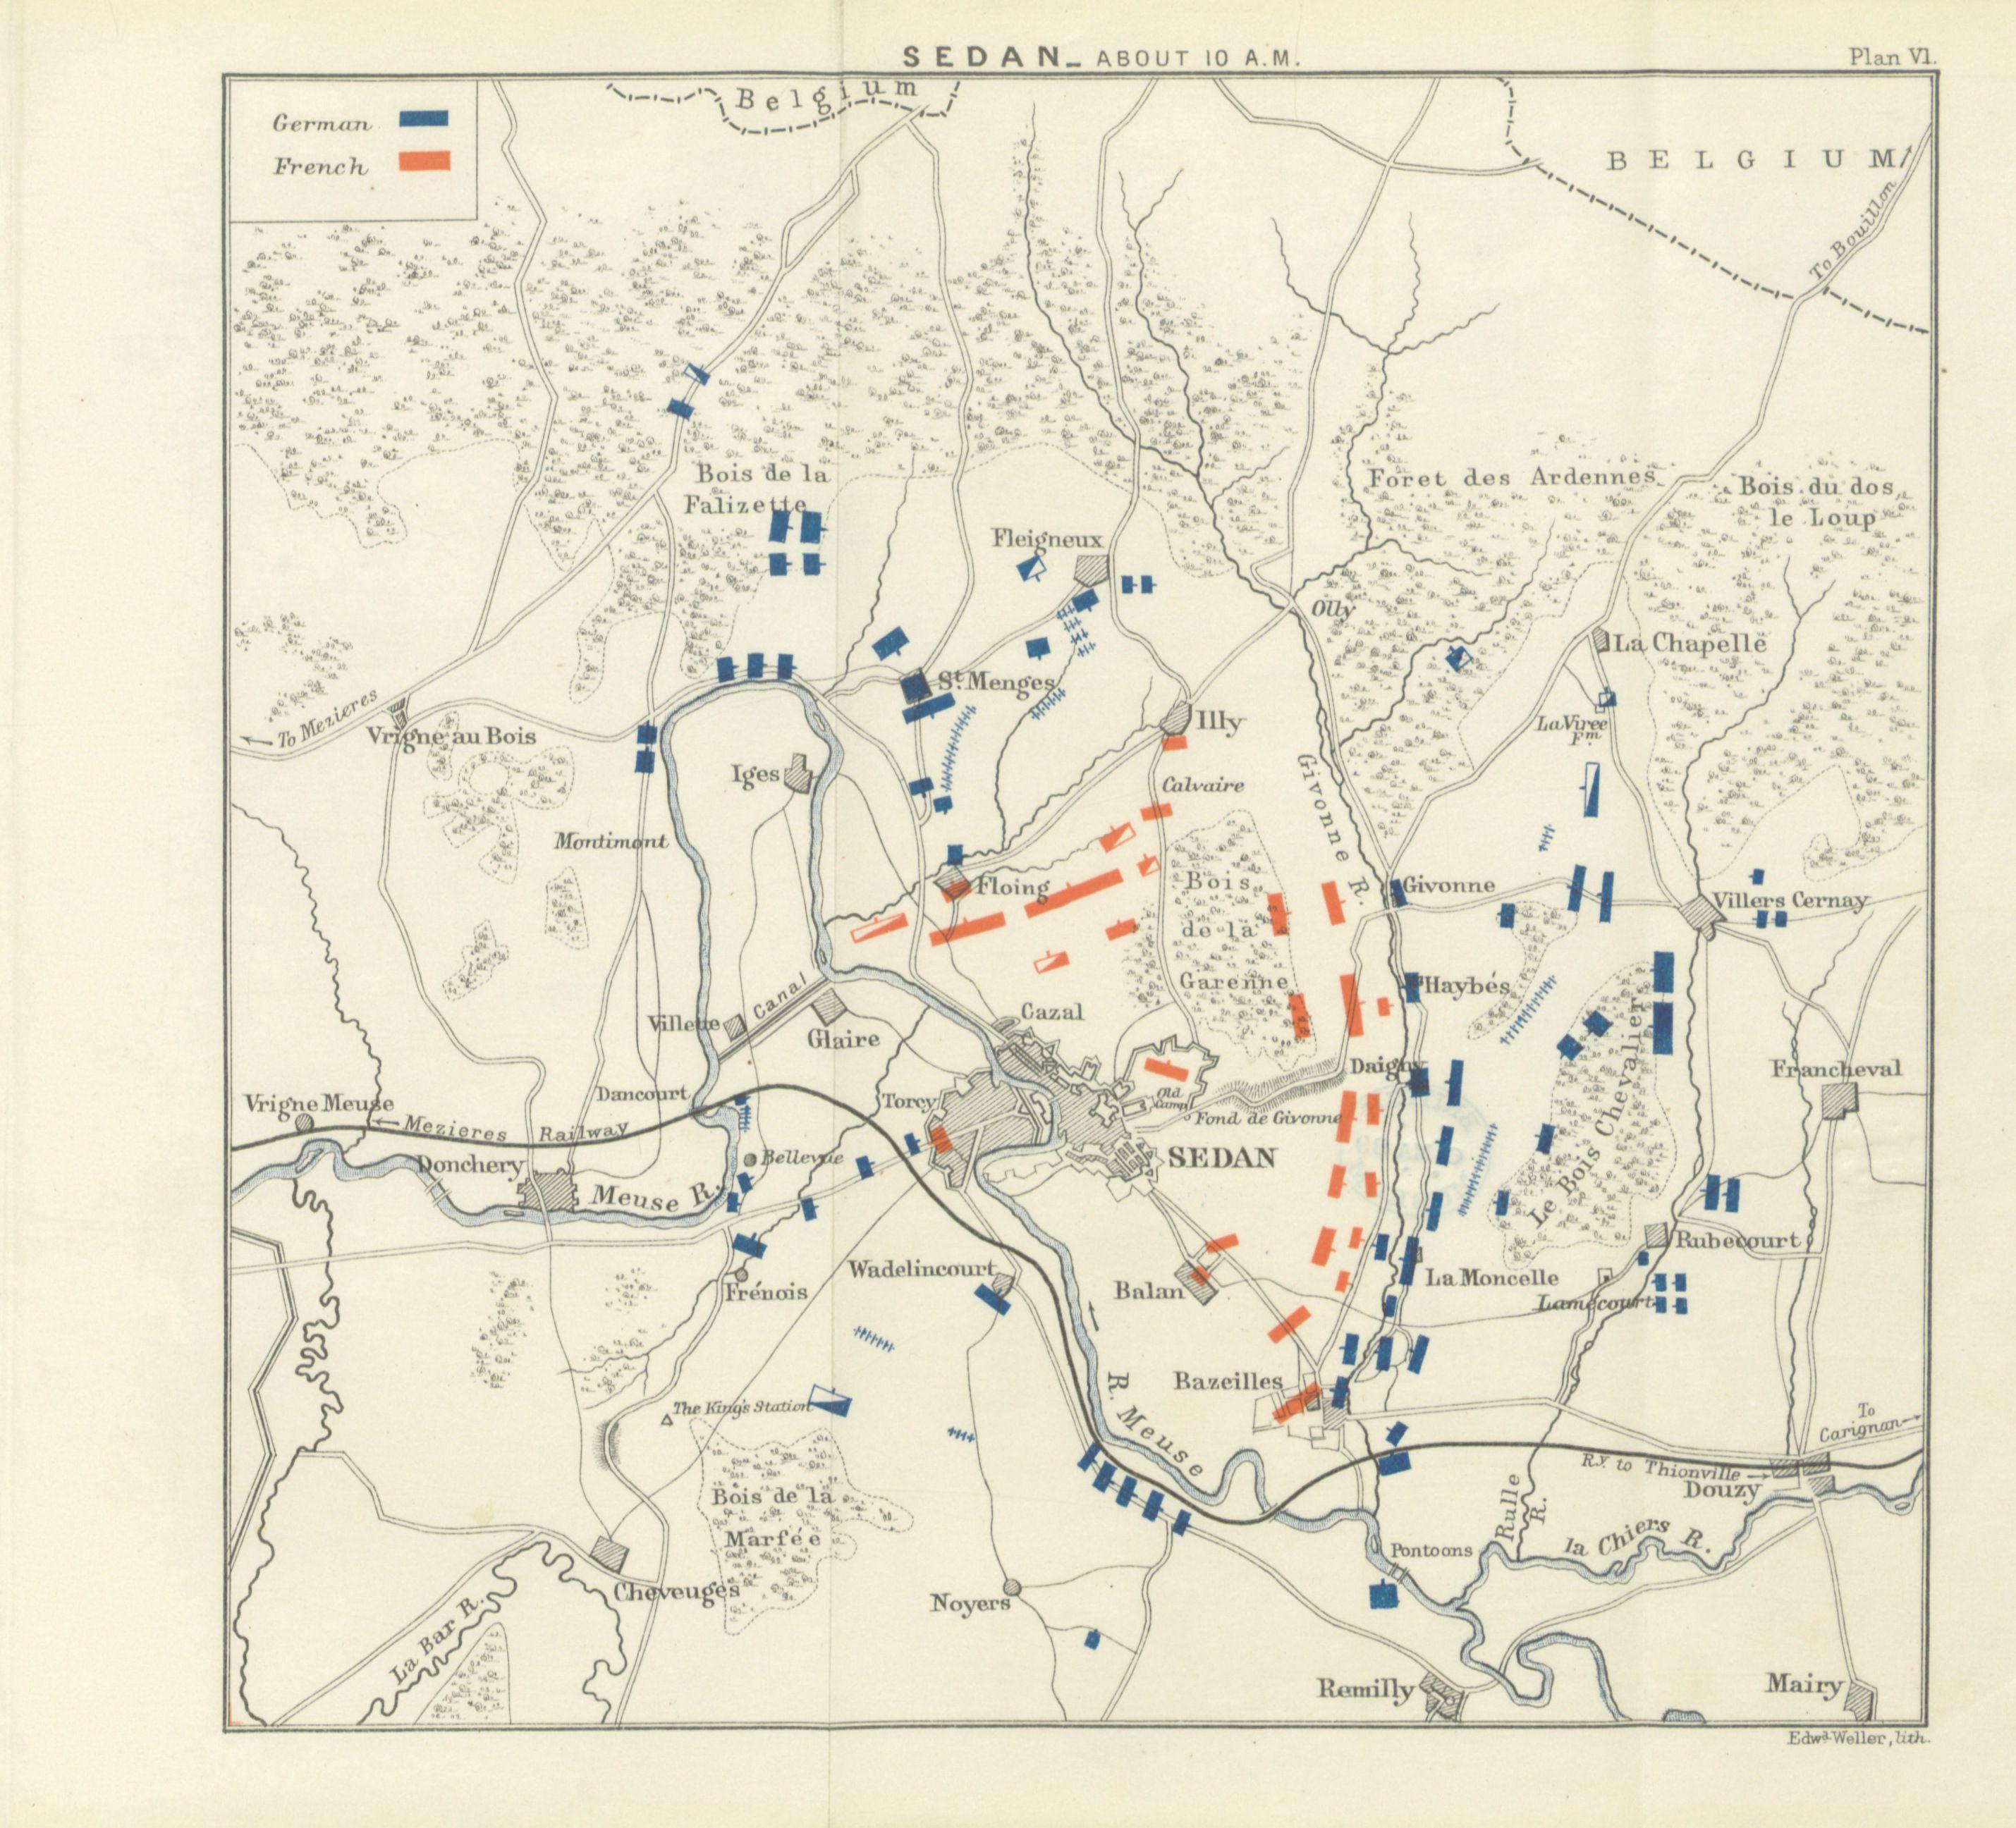 Battle of Sedan map